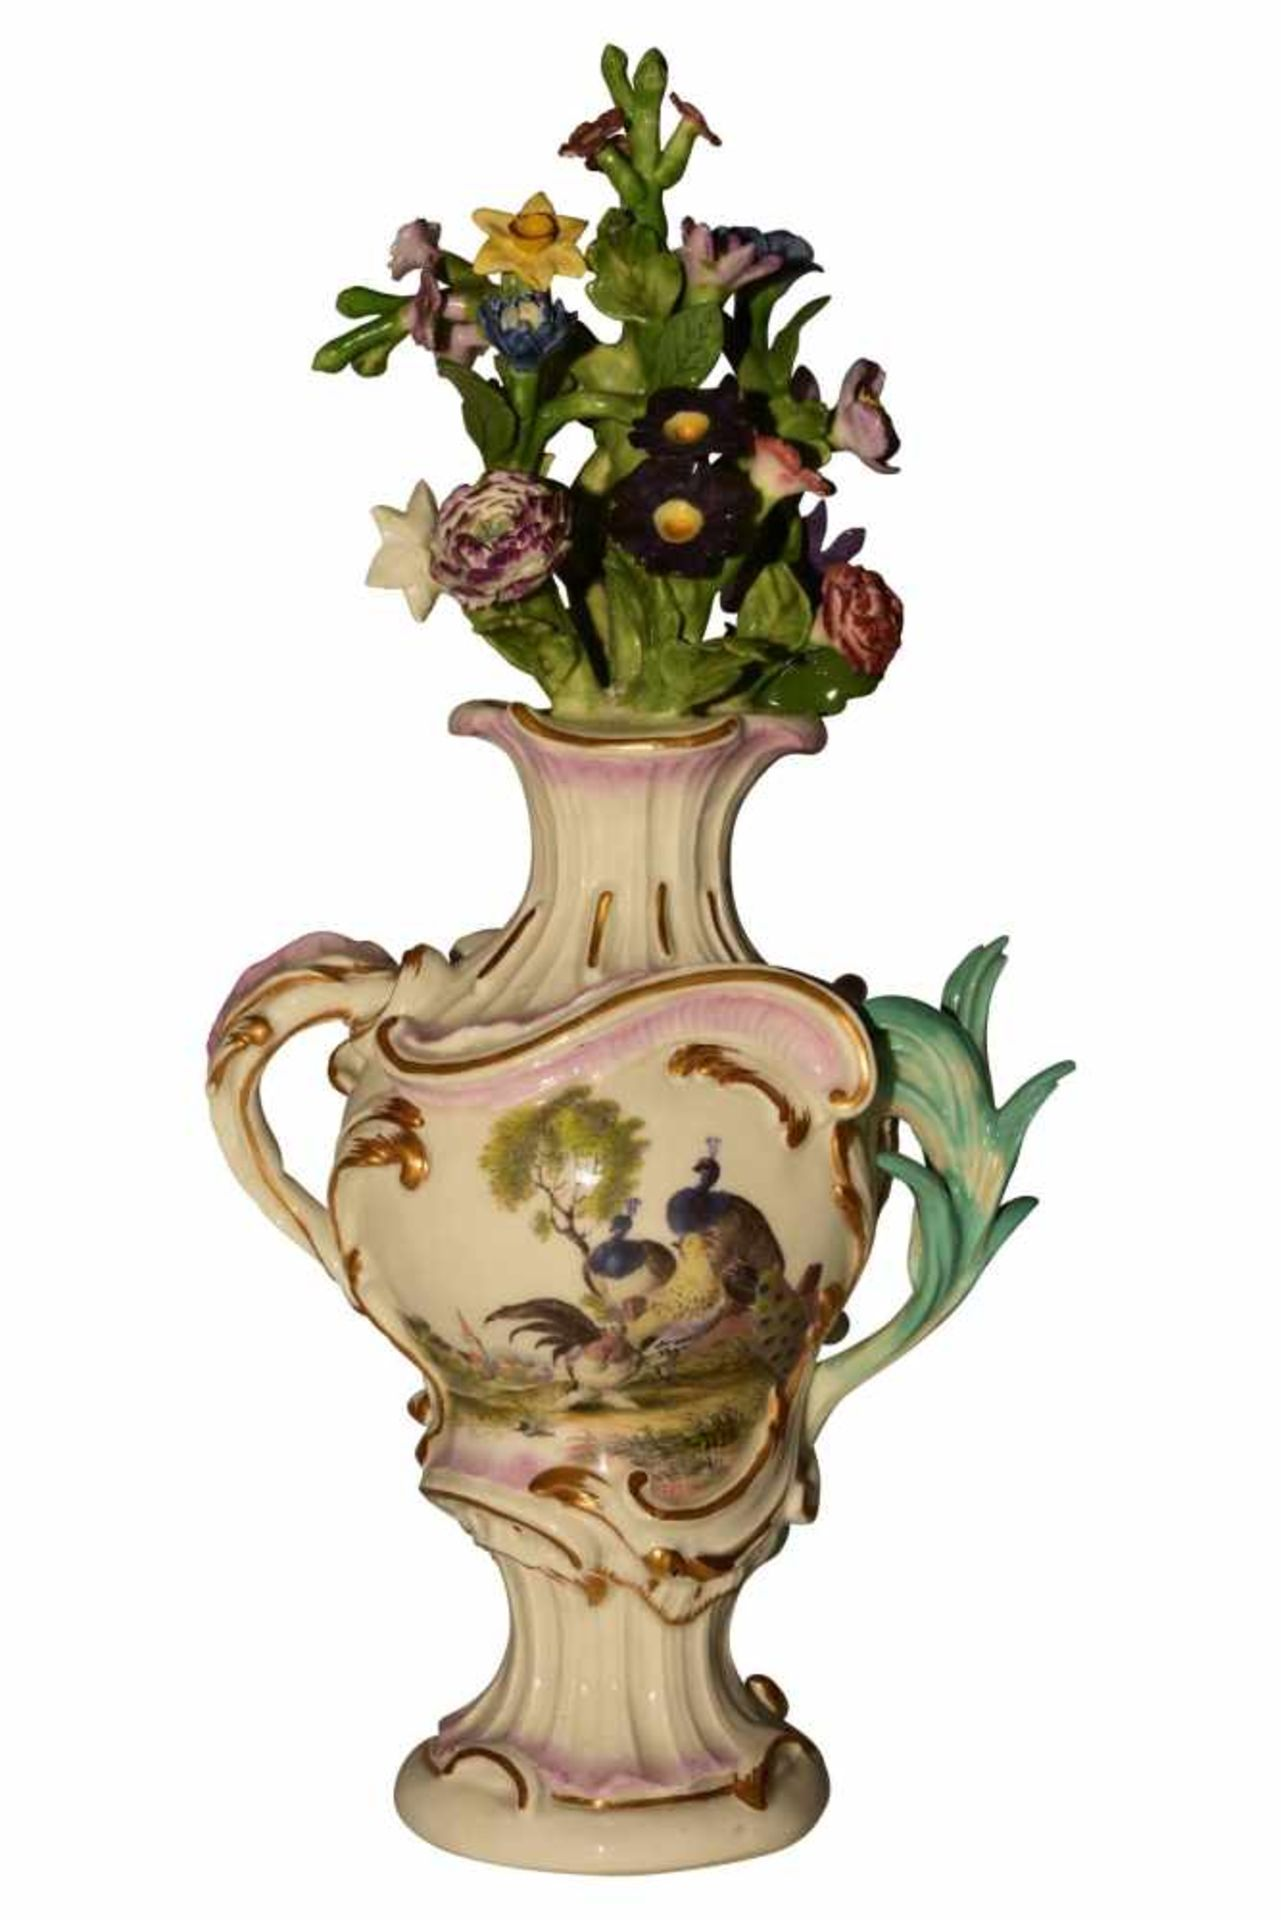 Pot Pouri Vase Meissen um 1750 - Bild 3 aus 6